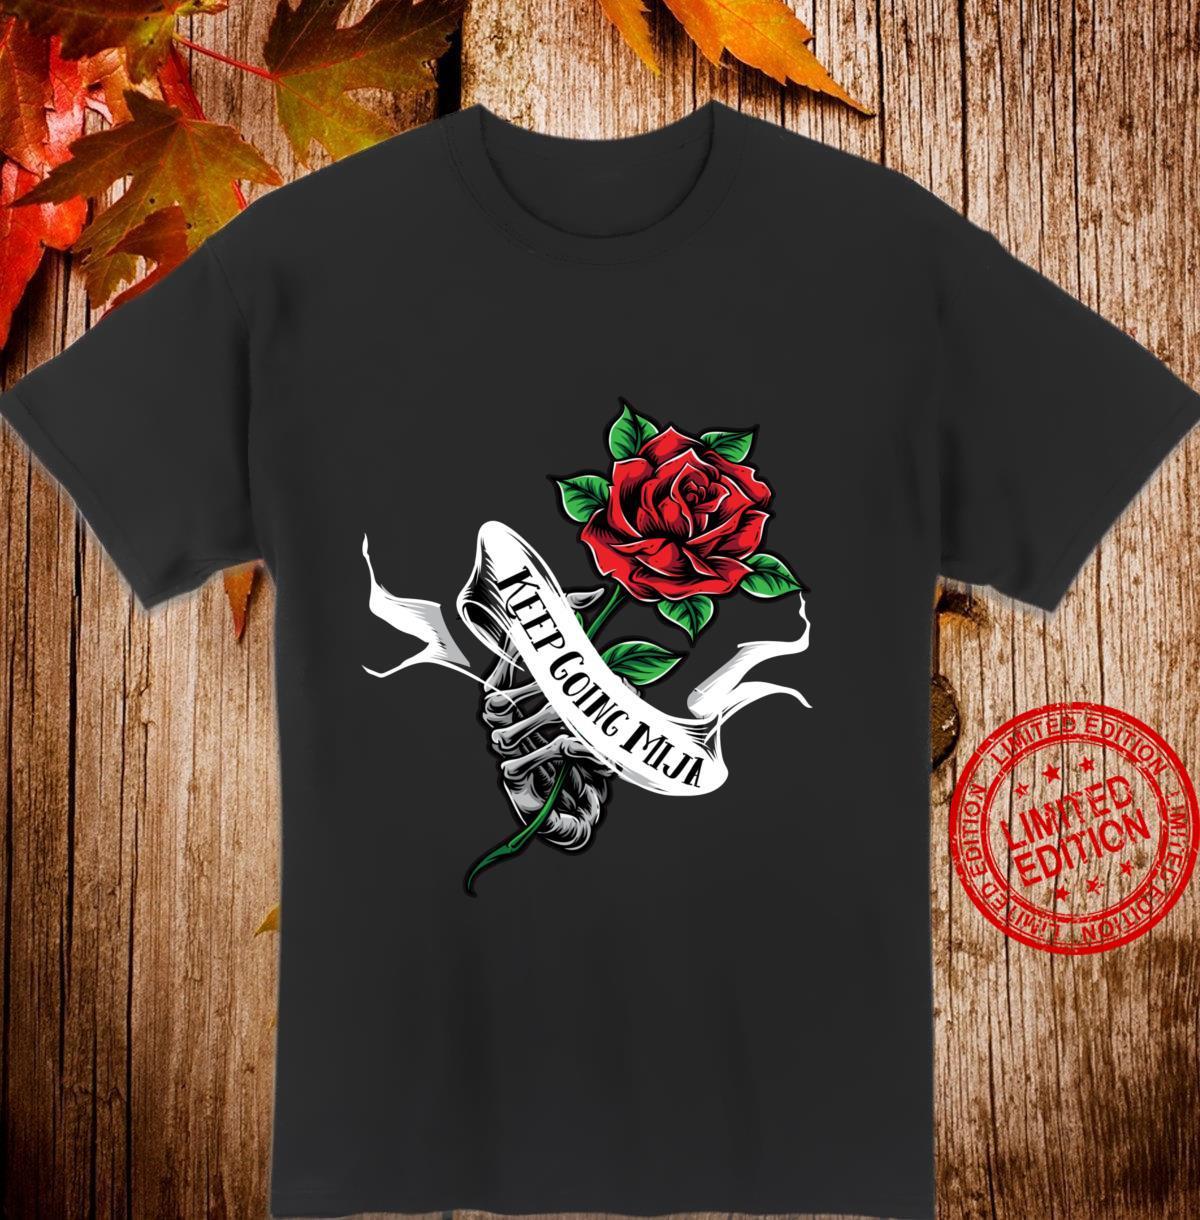 Keep Going Mija Hand Skull Floral Tattoo Design Shirt